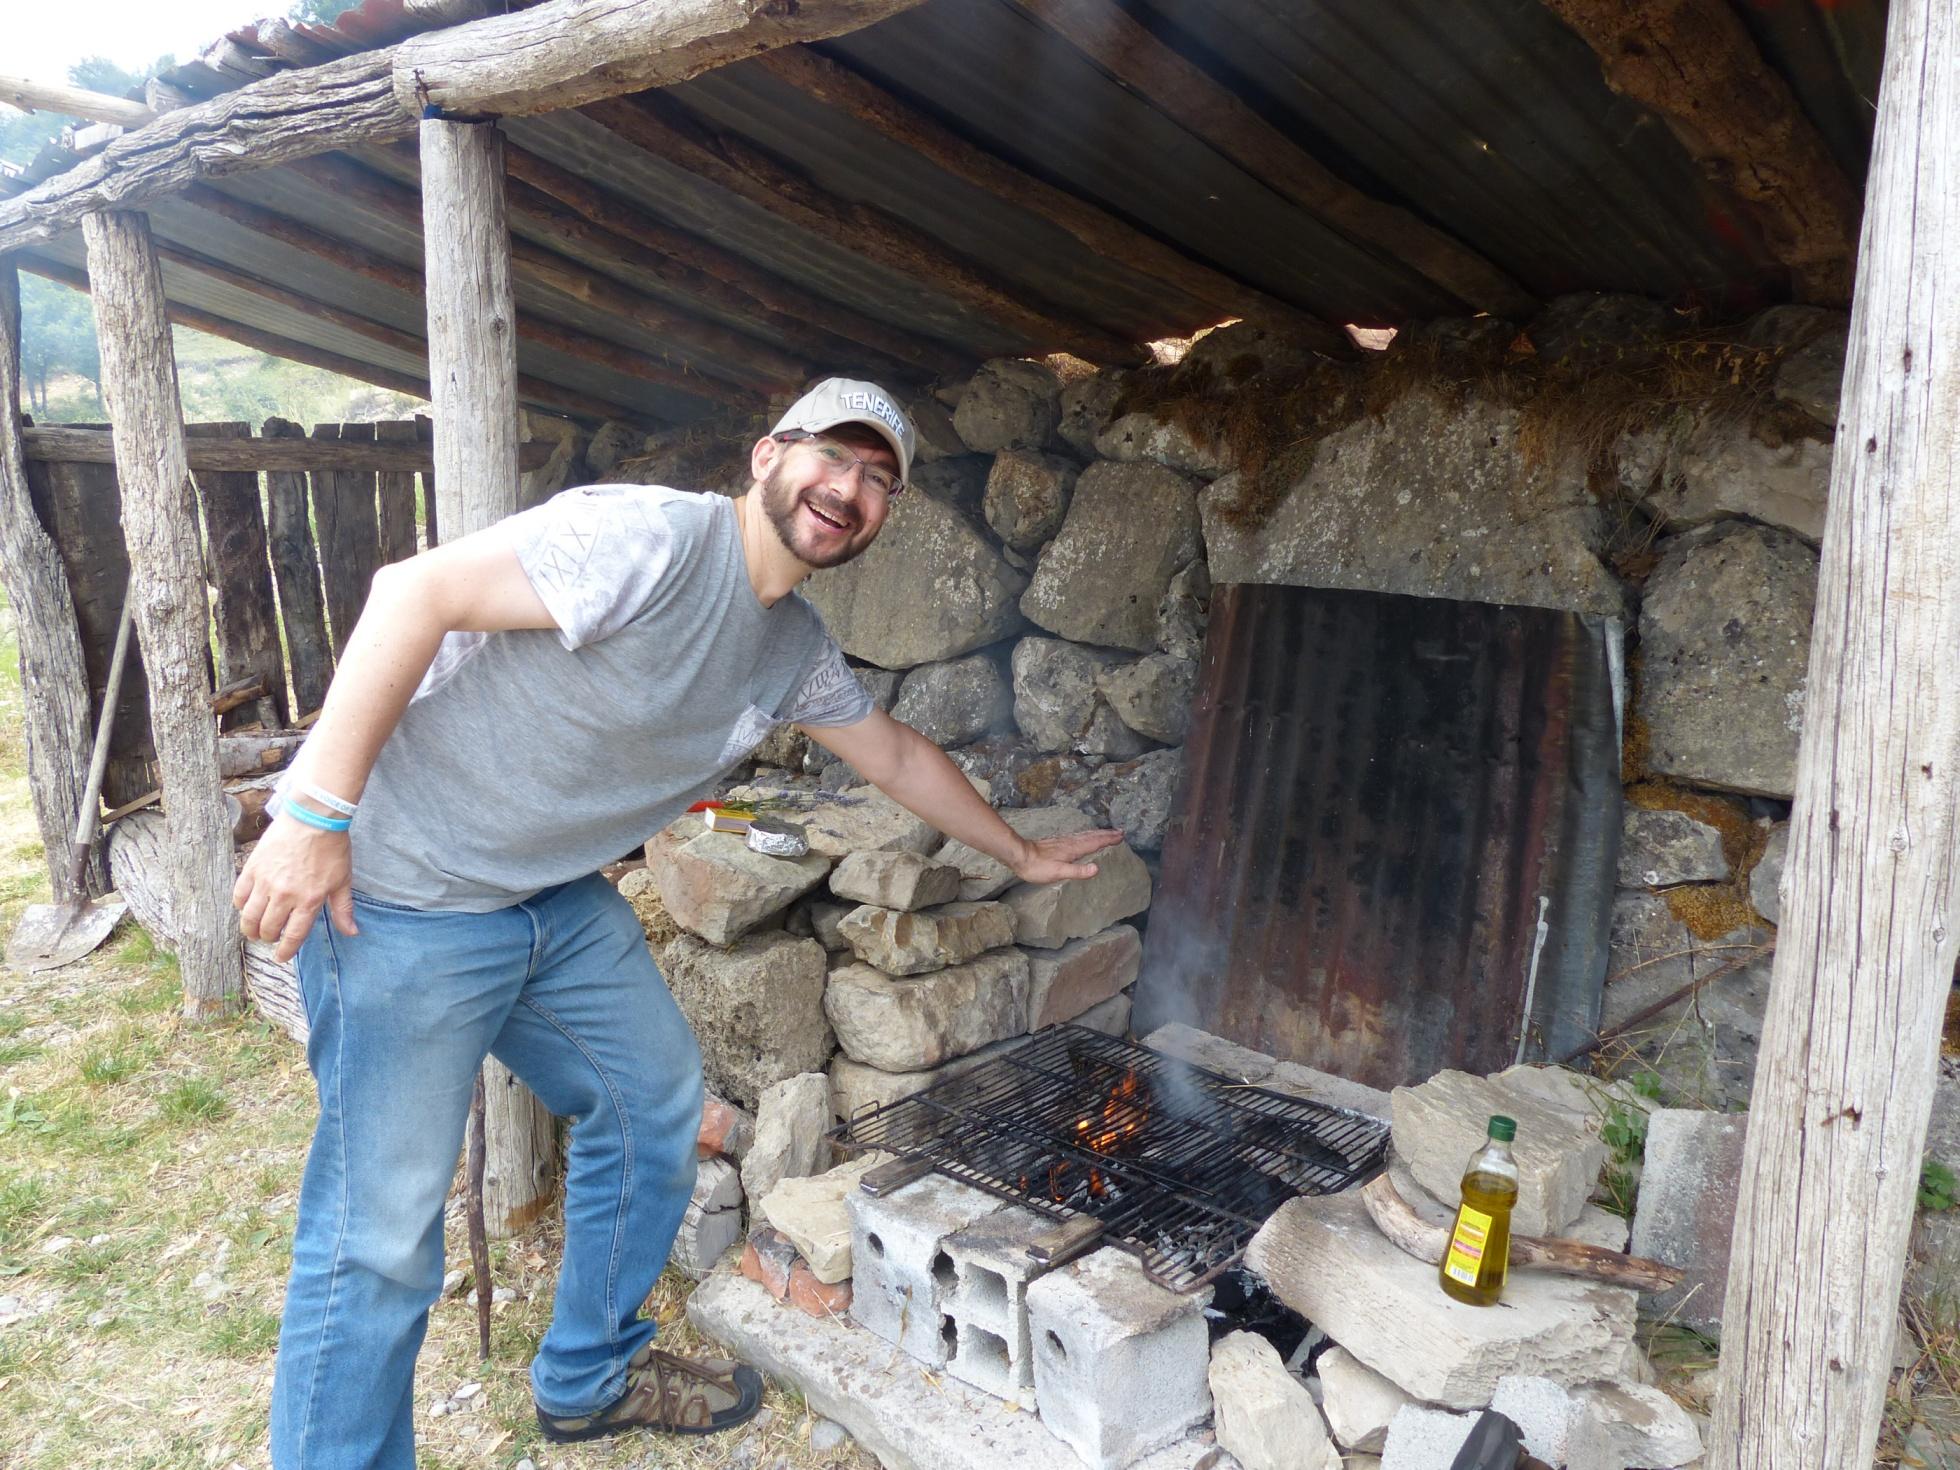 http://ekladata.com/tt0LZqJby6uU2eyqi1peS9mAXjg/Le-Poil-30-07-2016-barbecue.jpg